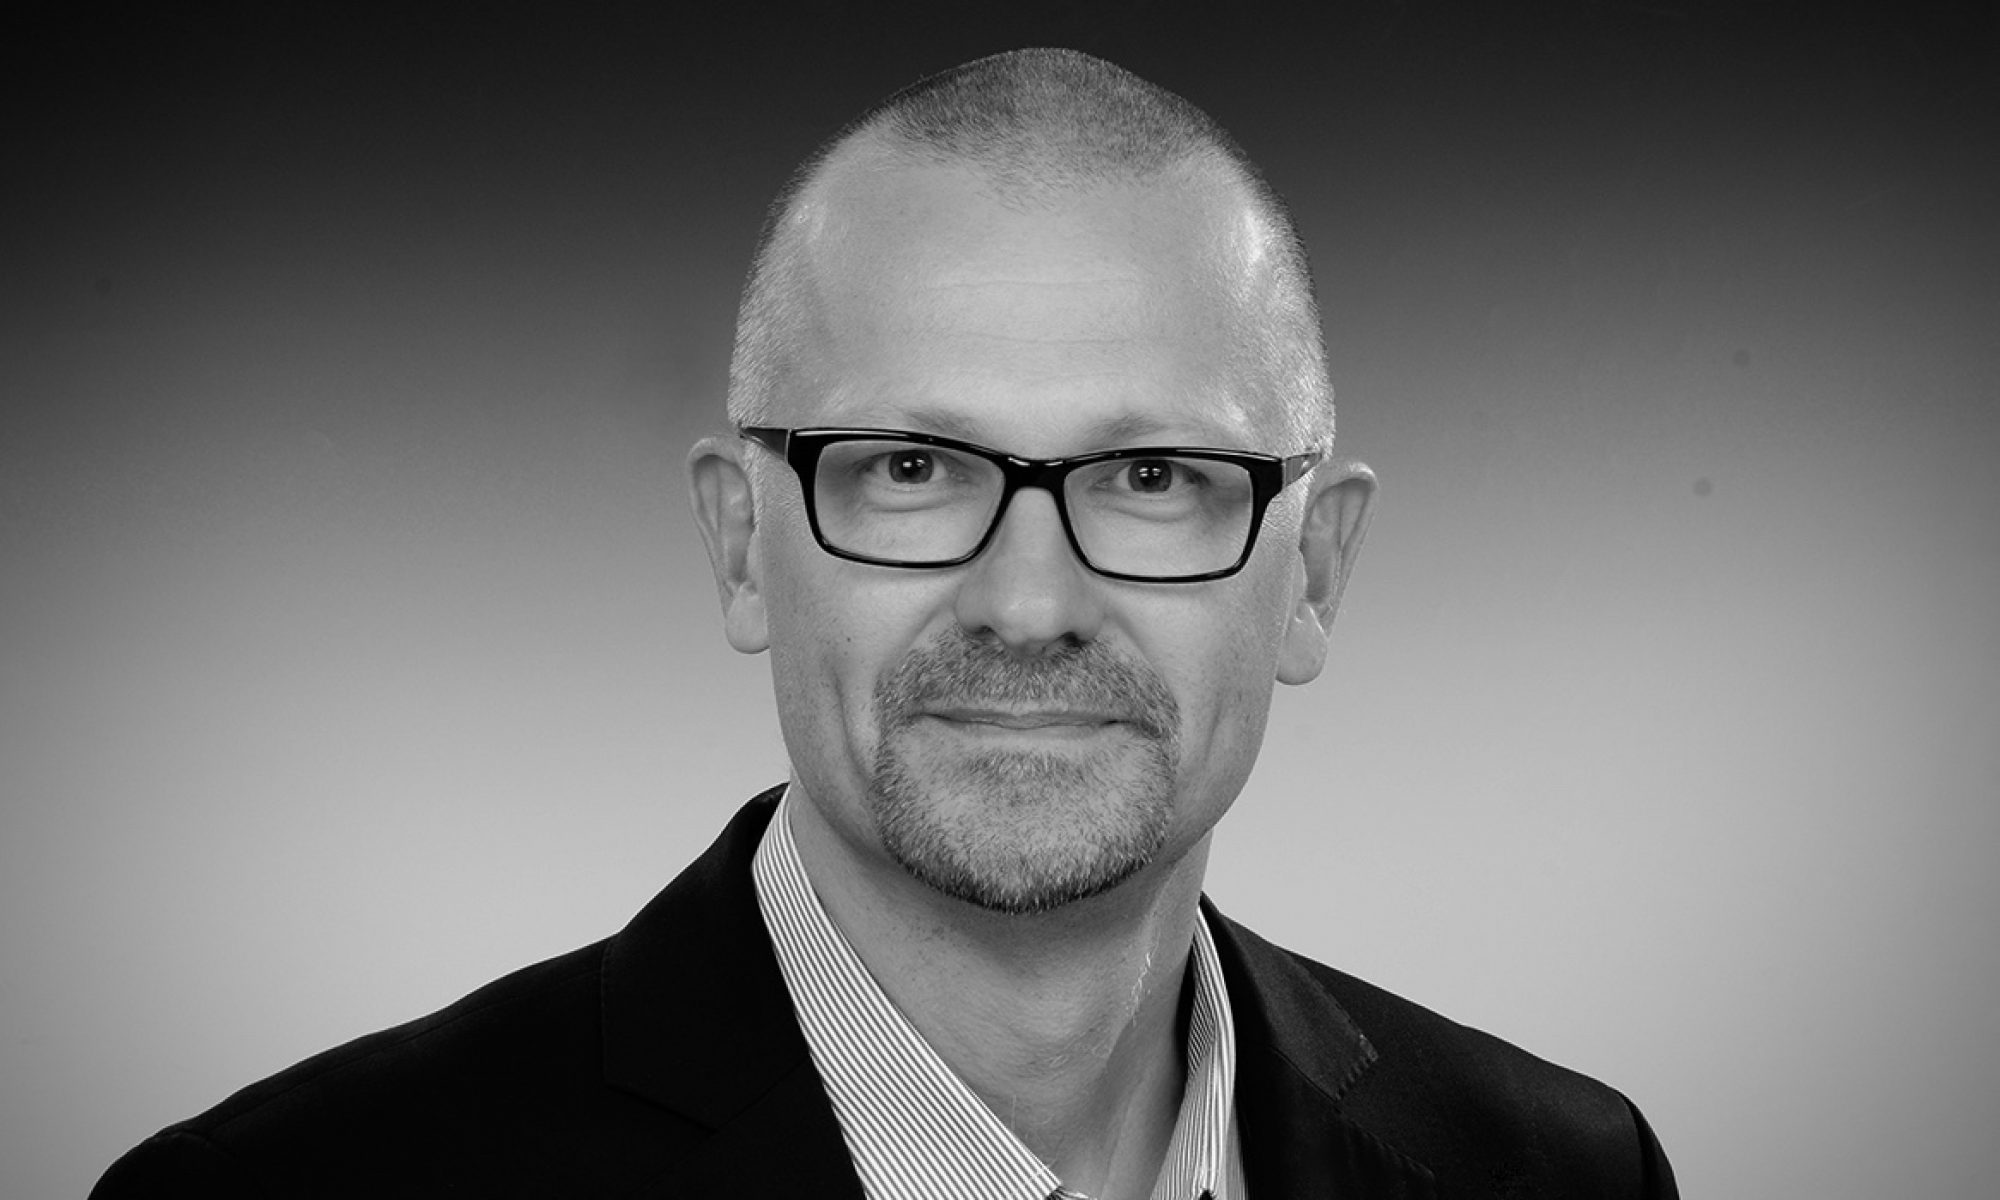 Thomas Wiemann